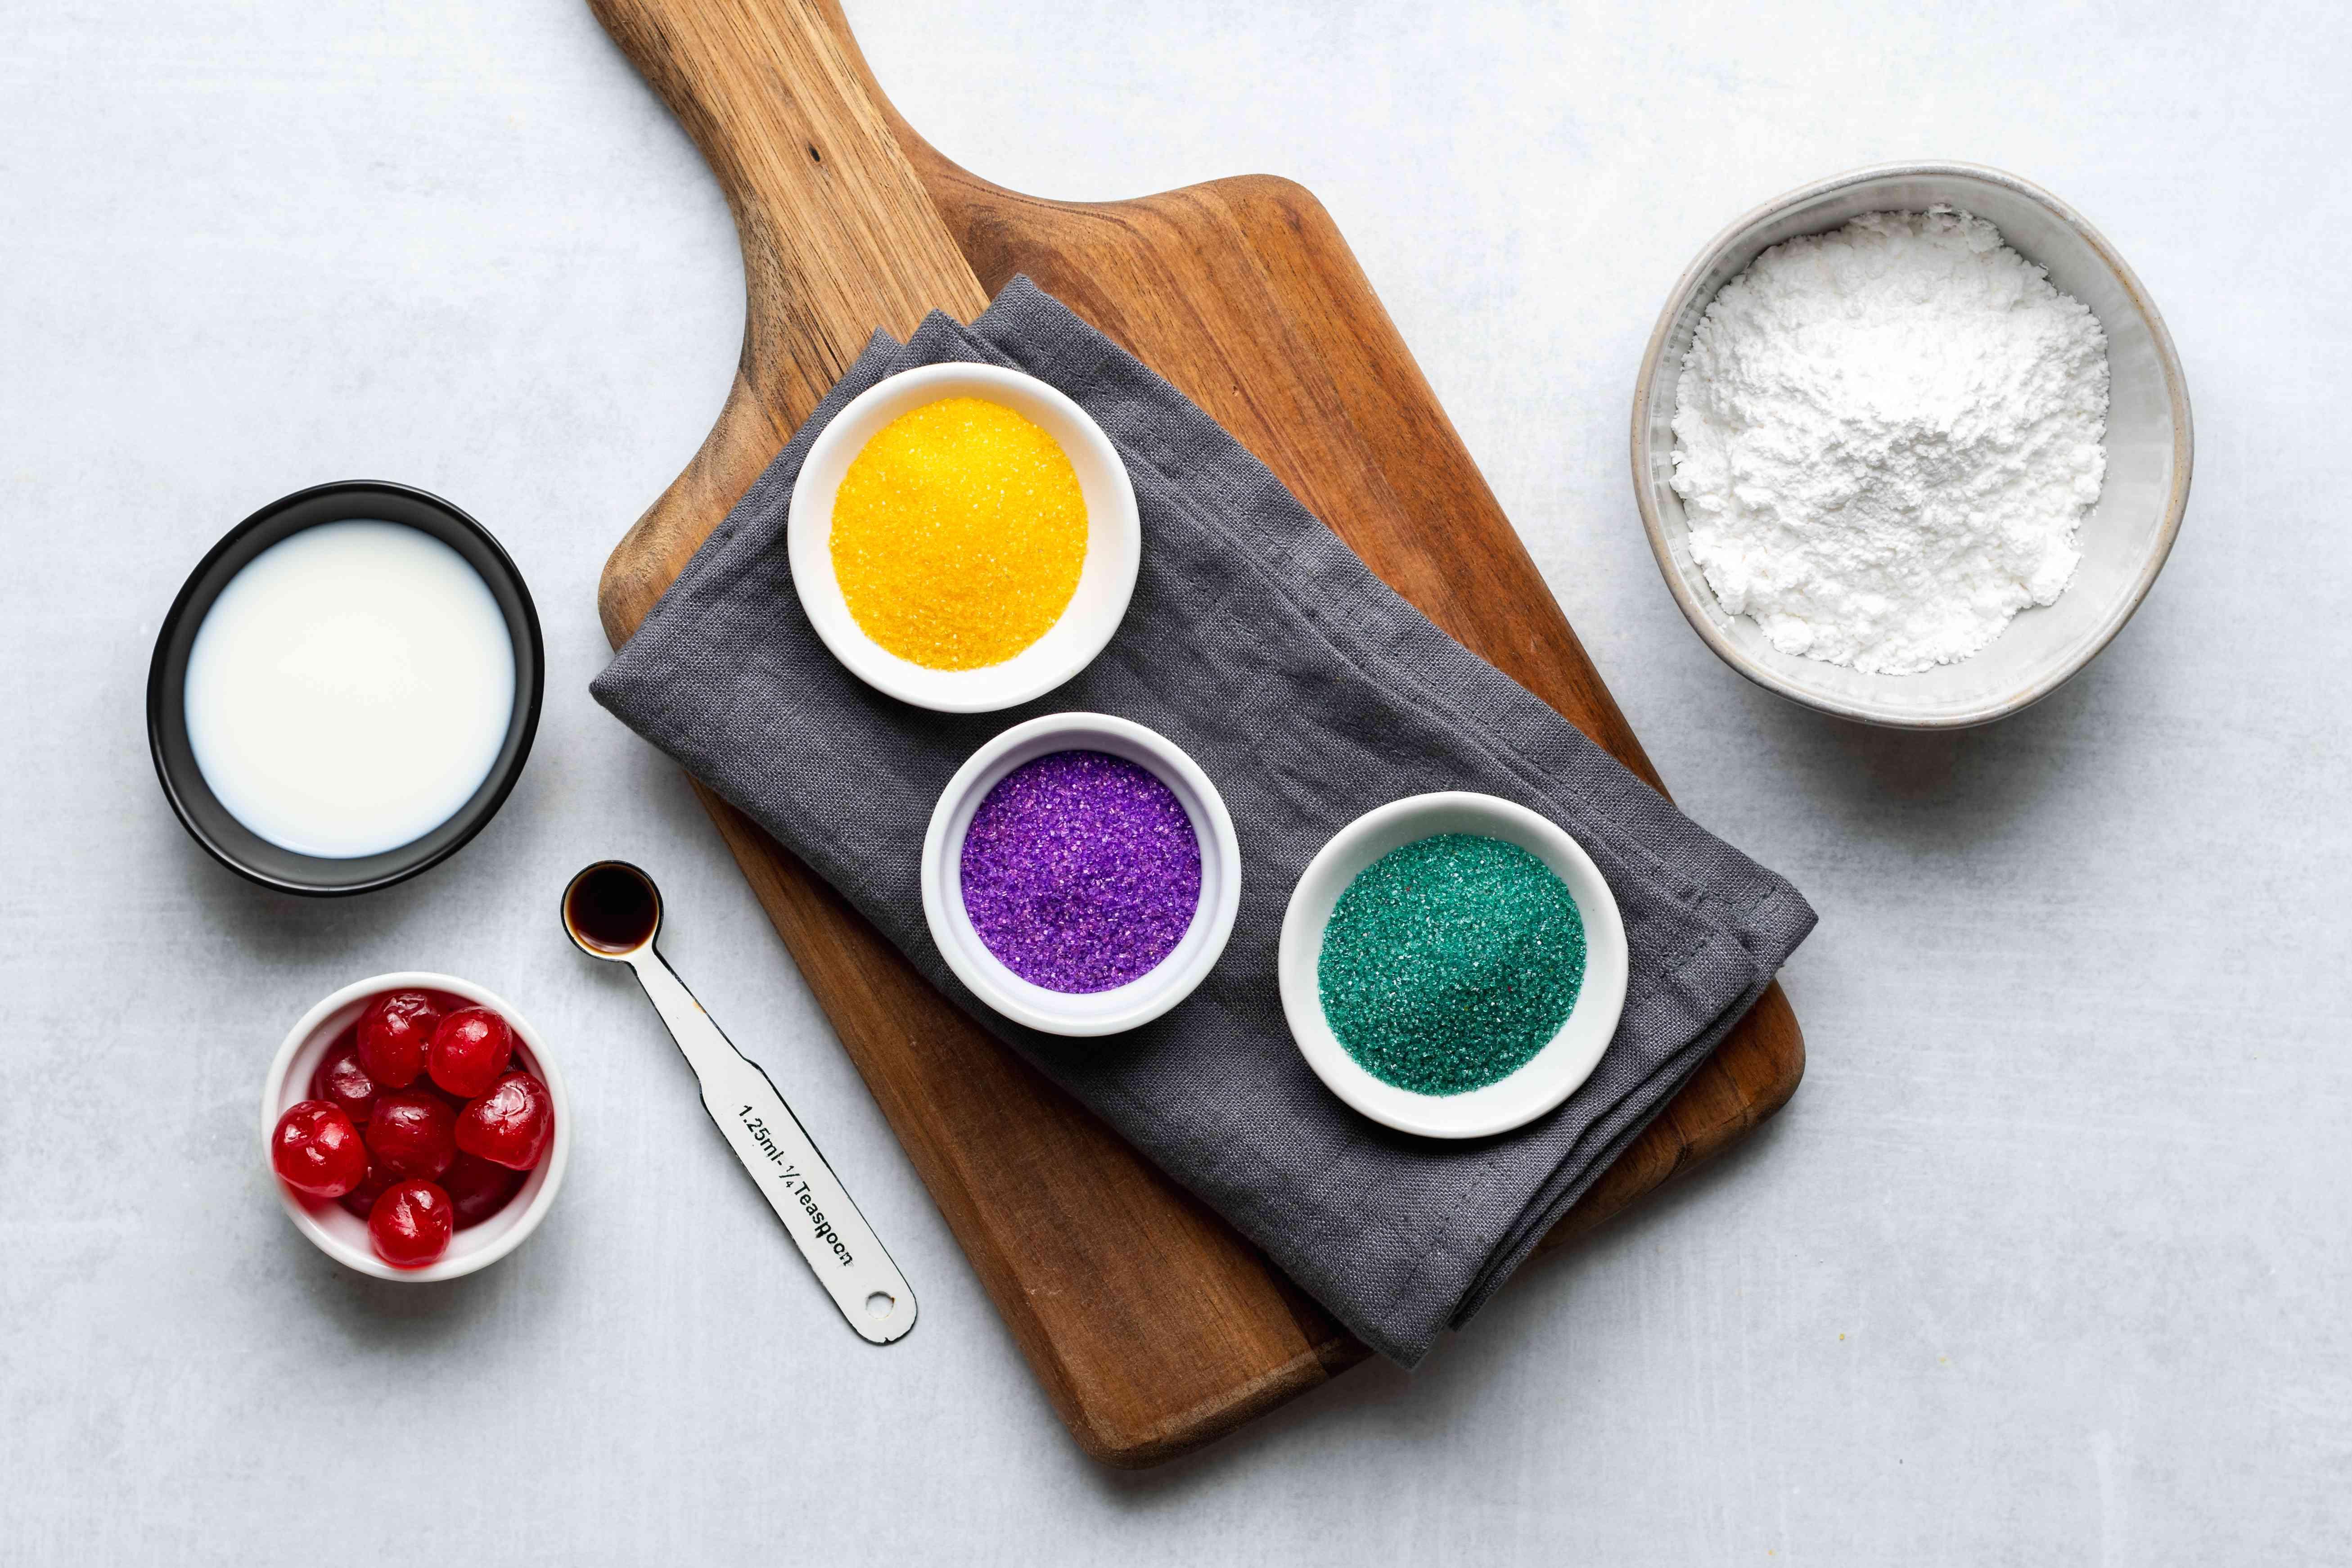 king cake glaze ingredients